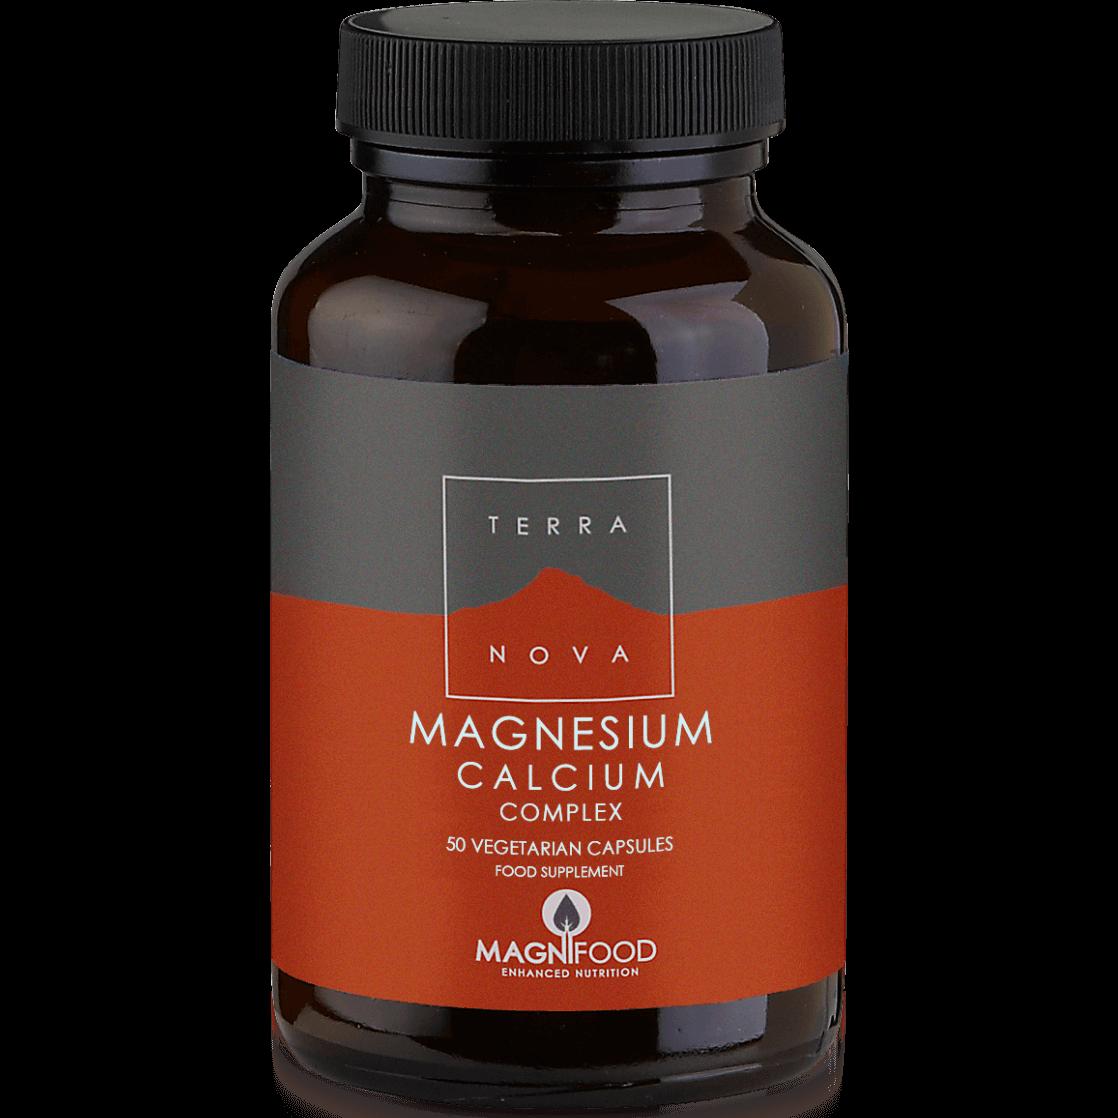 Terranova Magnesium Calcium Complex Μοναδική Σύνθεση Μαγνησίου με Ασβέστιο για Μέγιστη Απορρόφηση 50caps